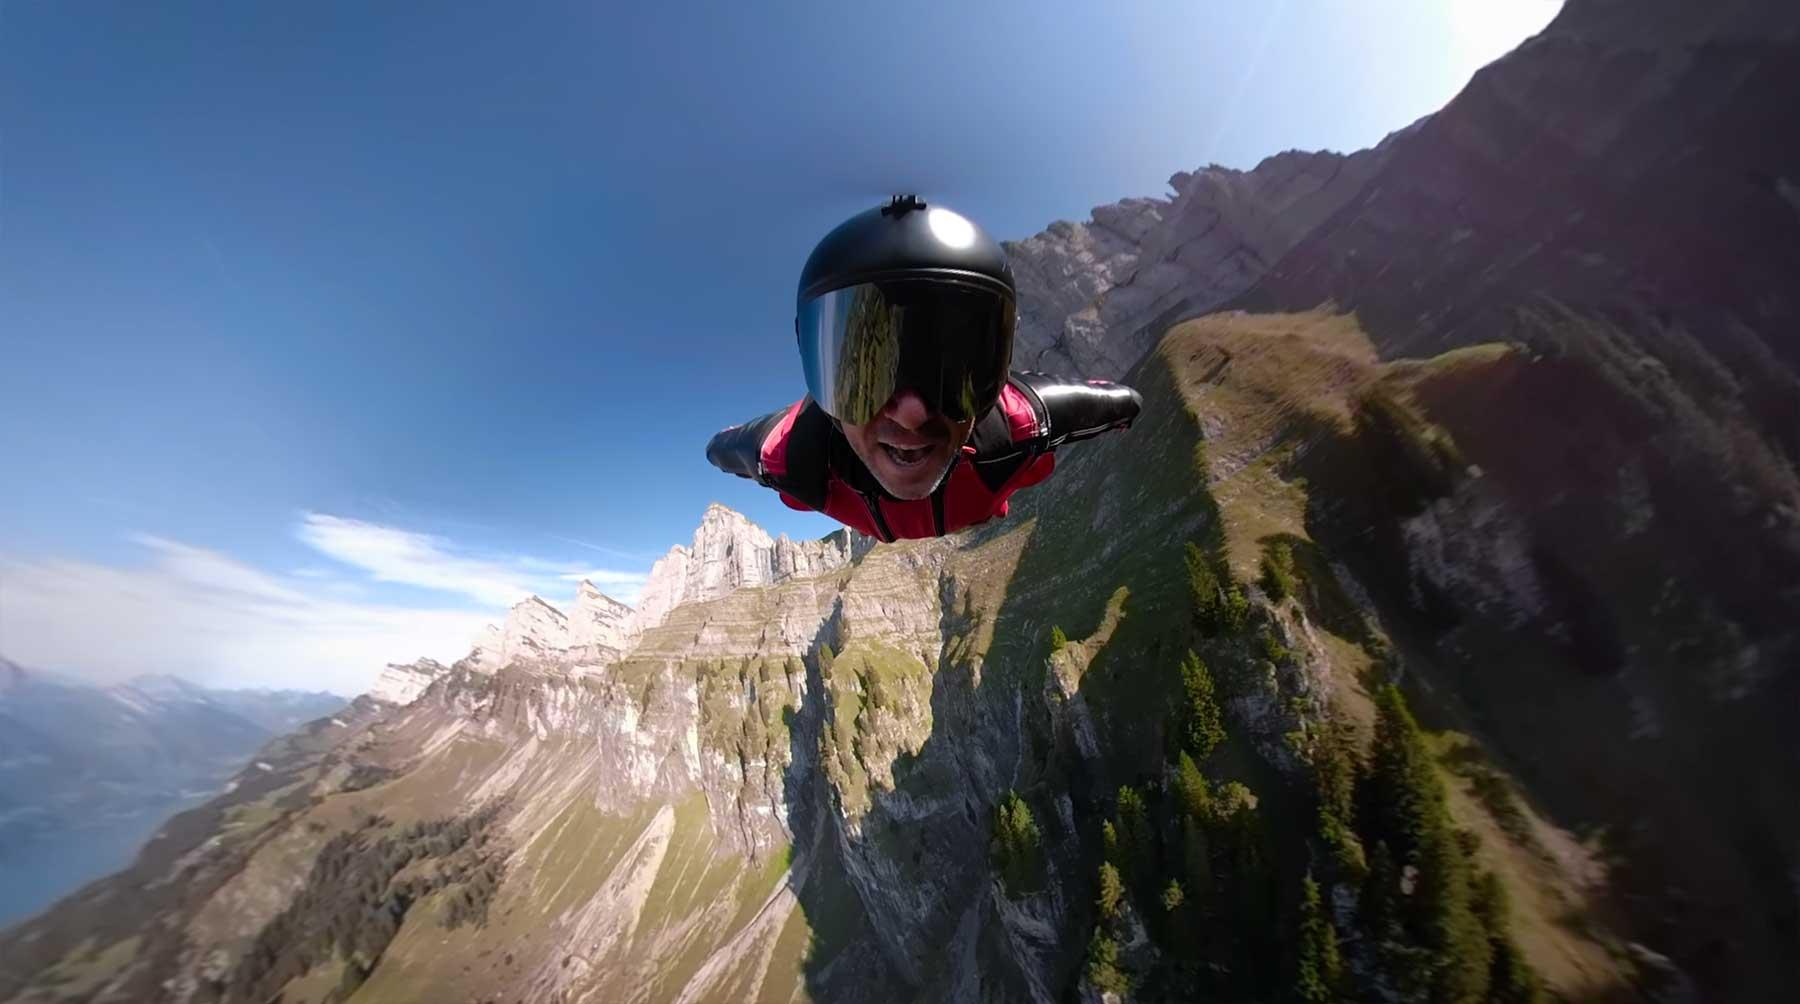 Sänger performt Song im Wingsuit-Flug wingsuit-musikvideo-im-freien-fall-singen